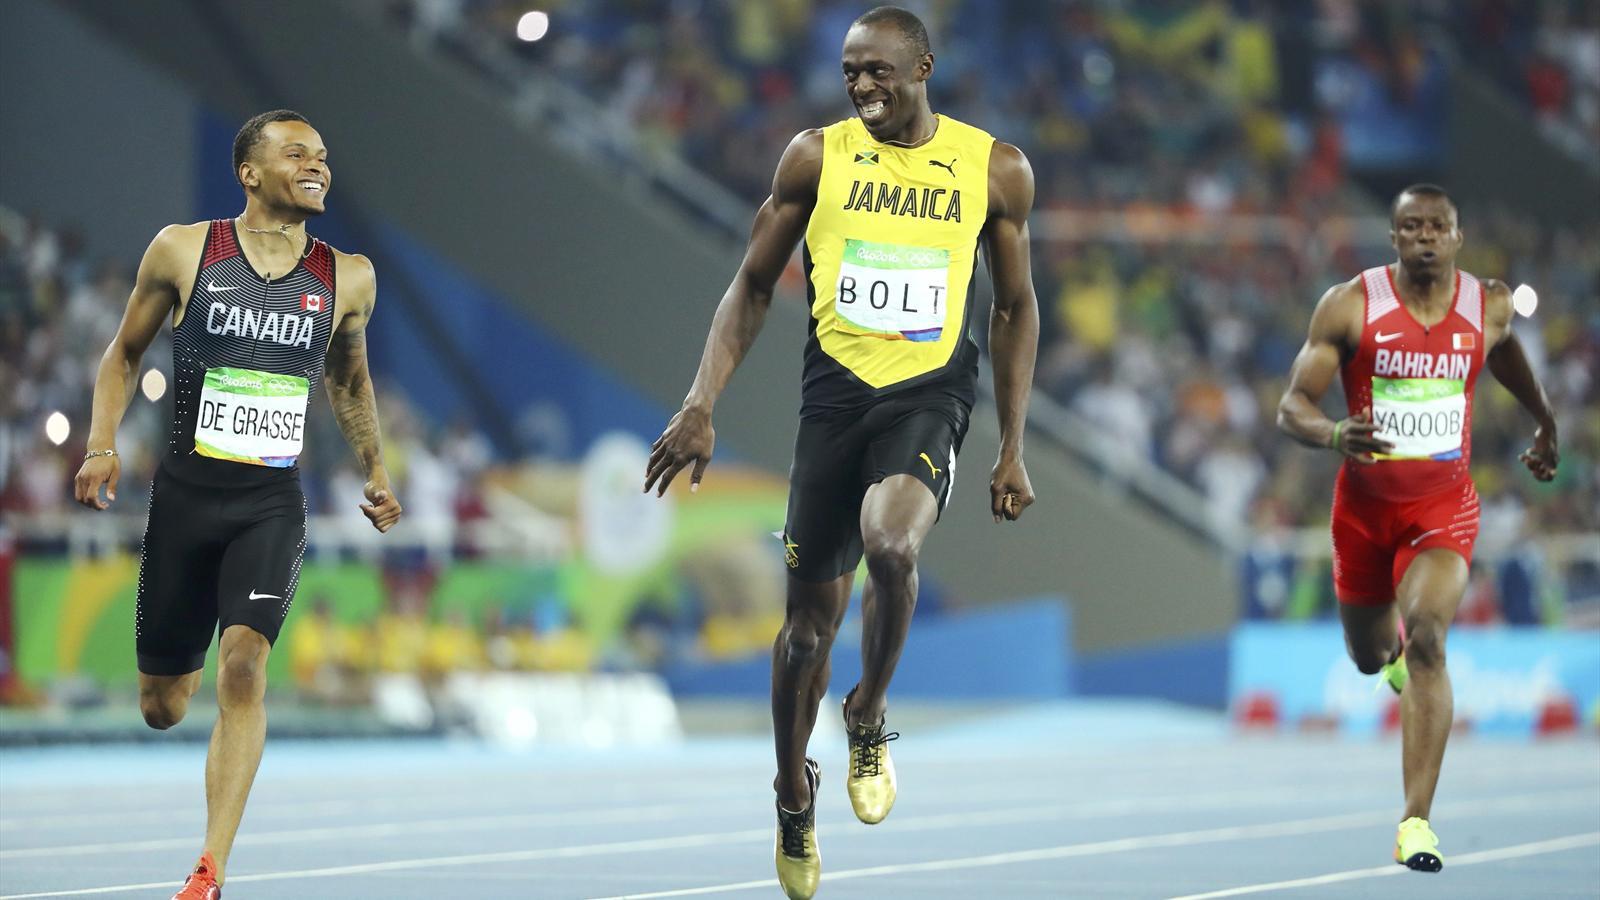 Can Usain Bolt Break His 200m World Record